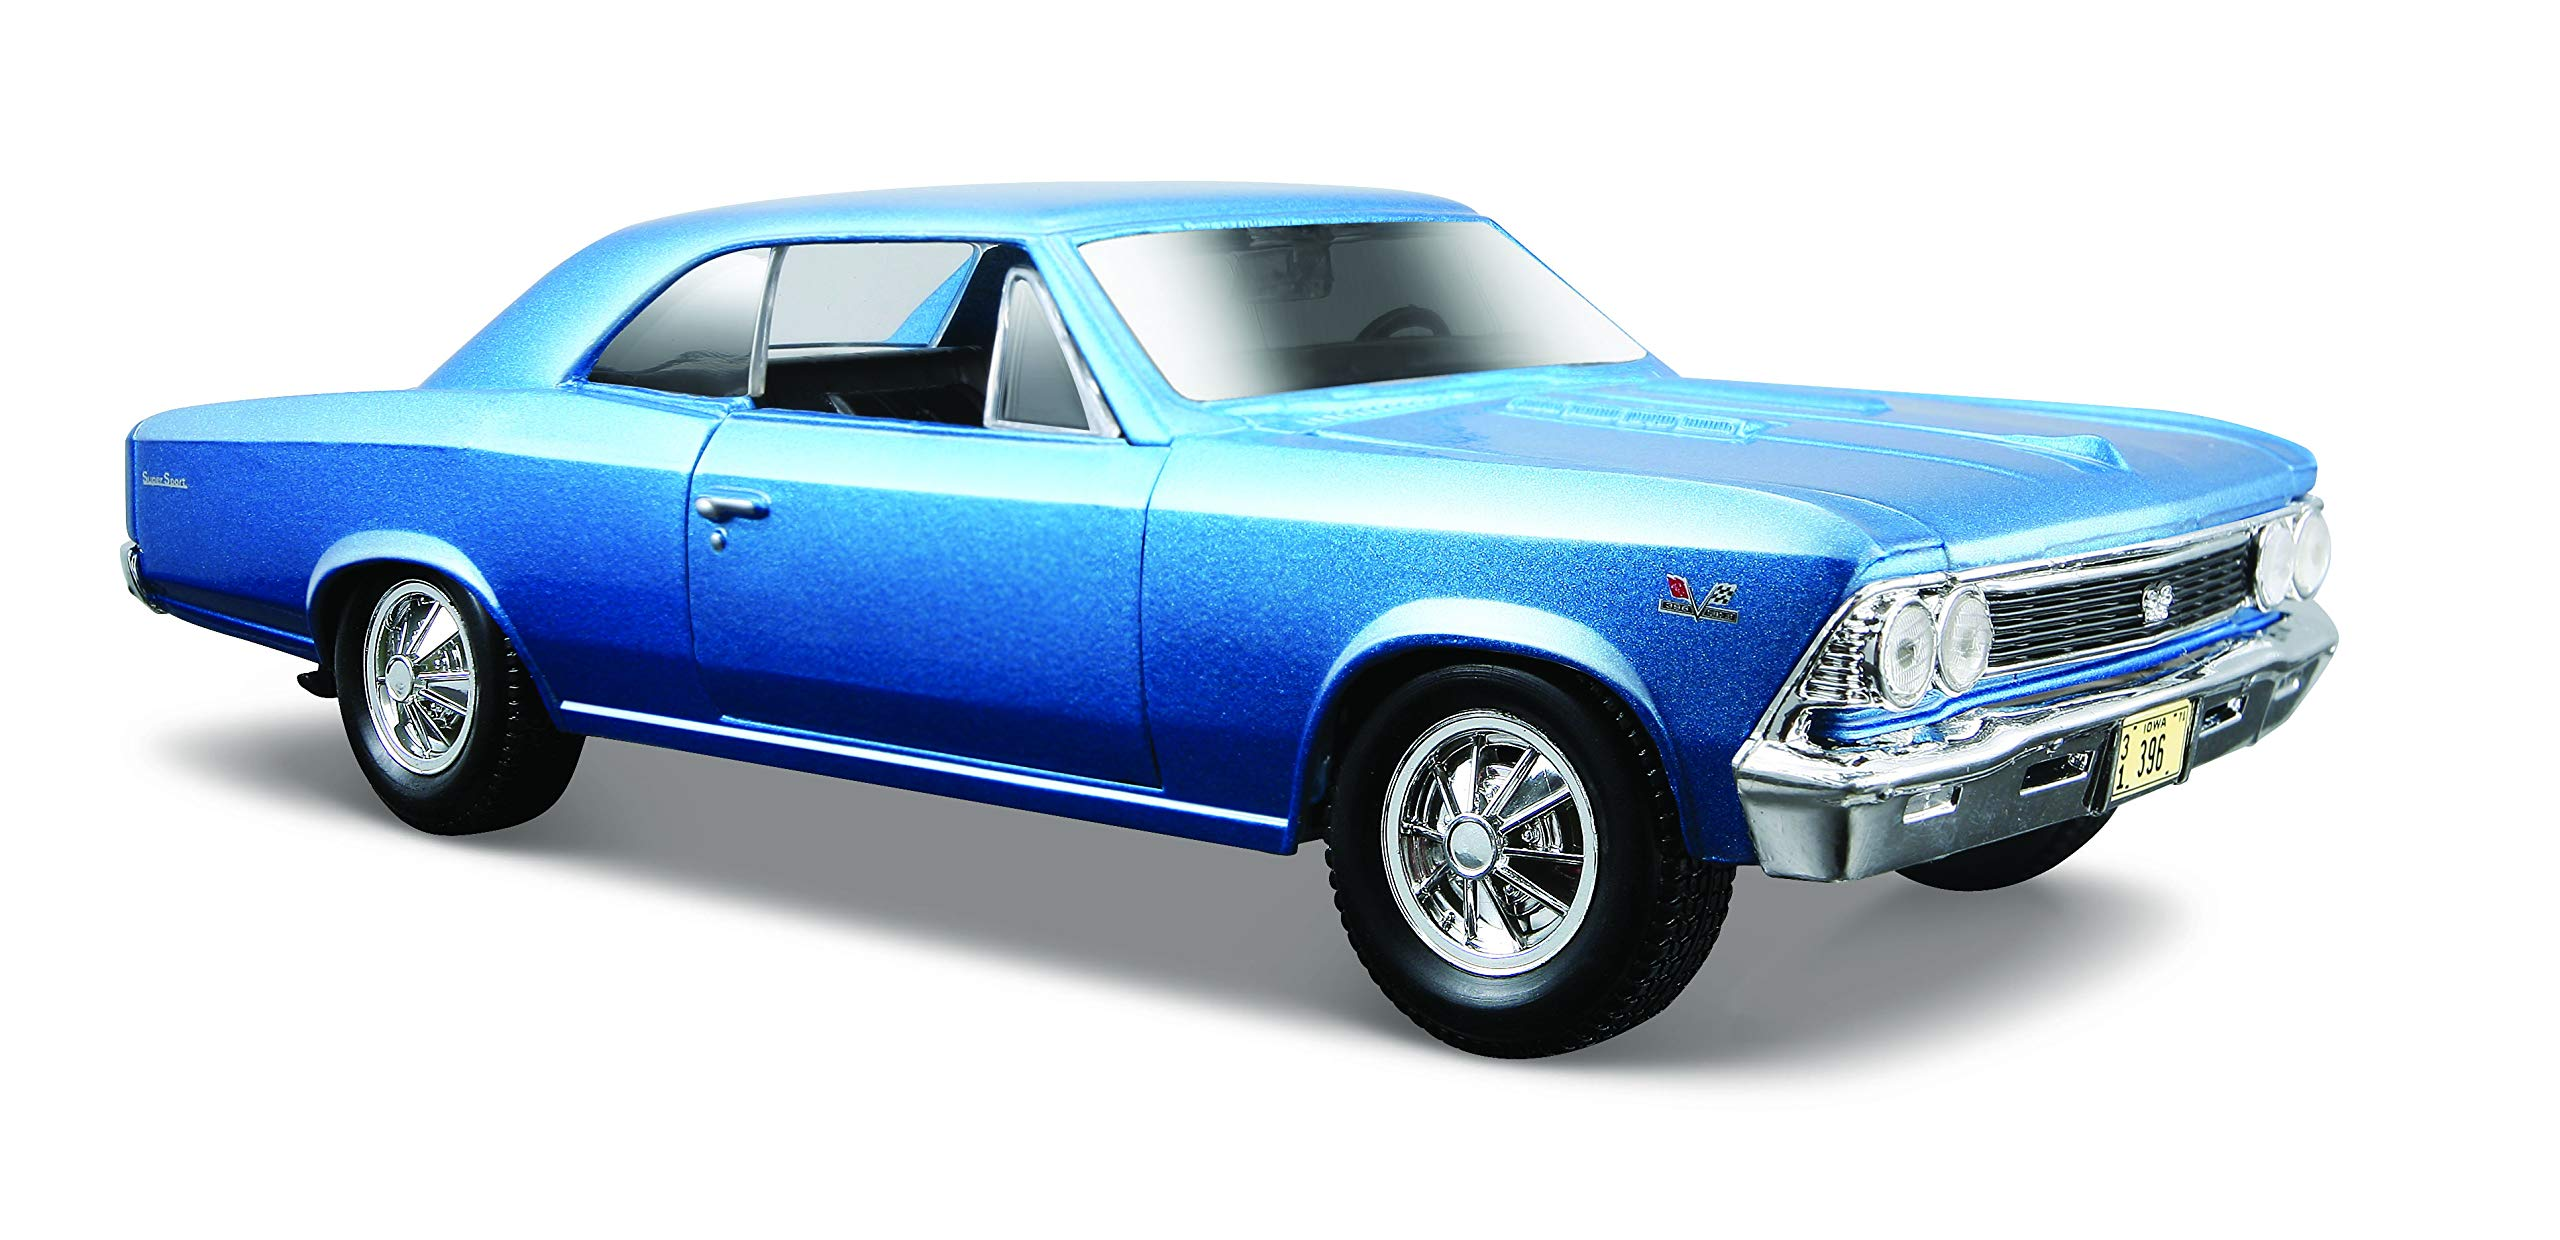 Maisto 1:24 1966 Chevy Chevelle SS 396 Model Car, Multicolor